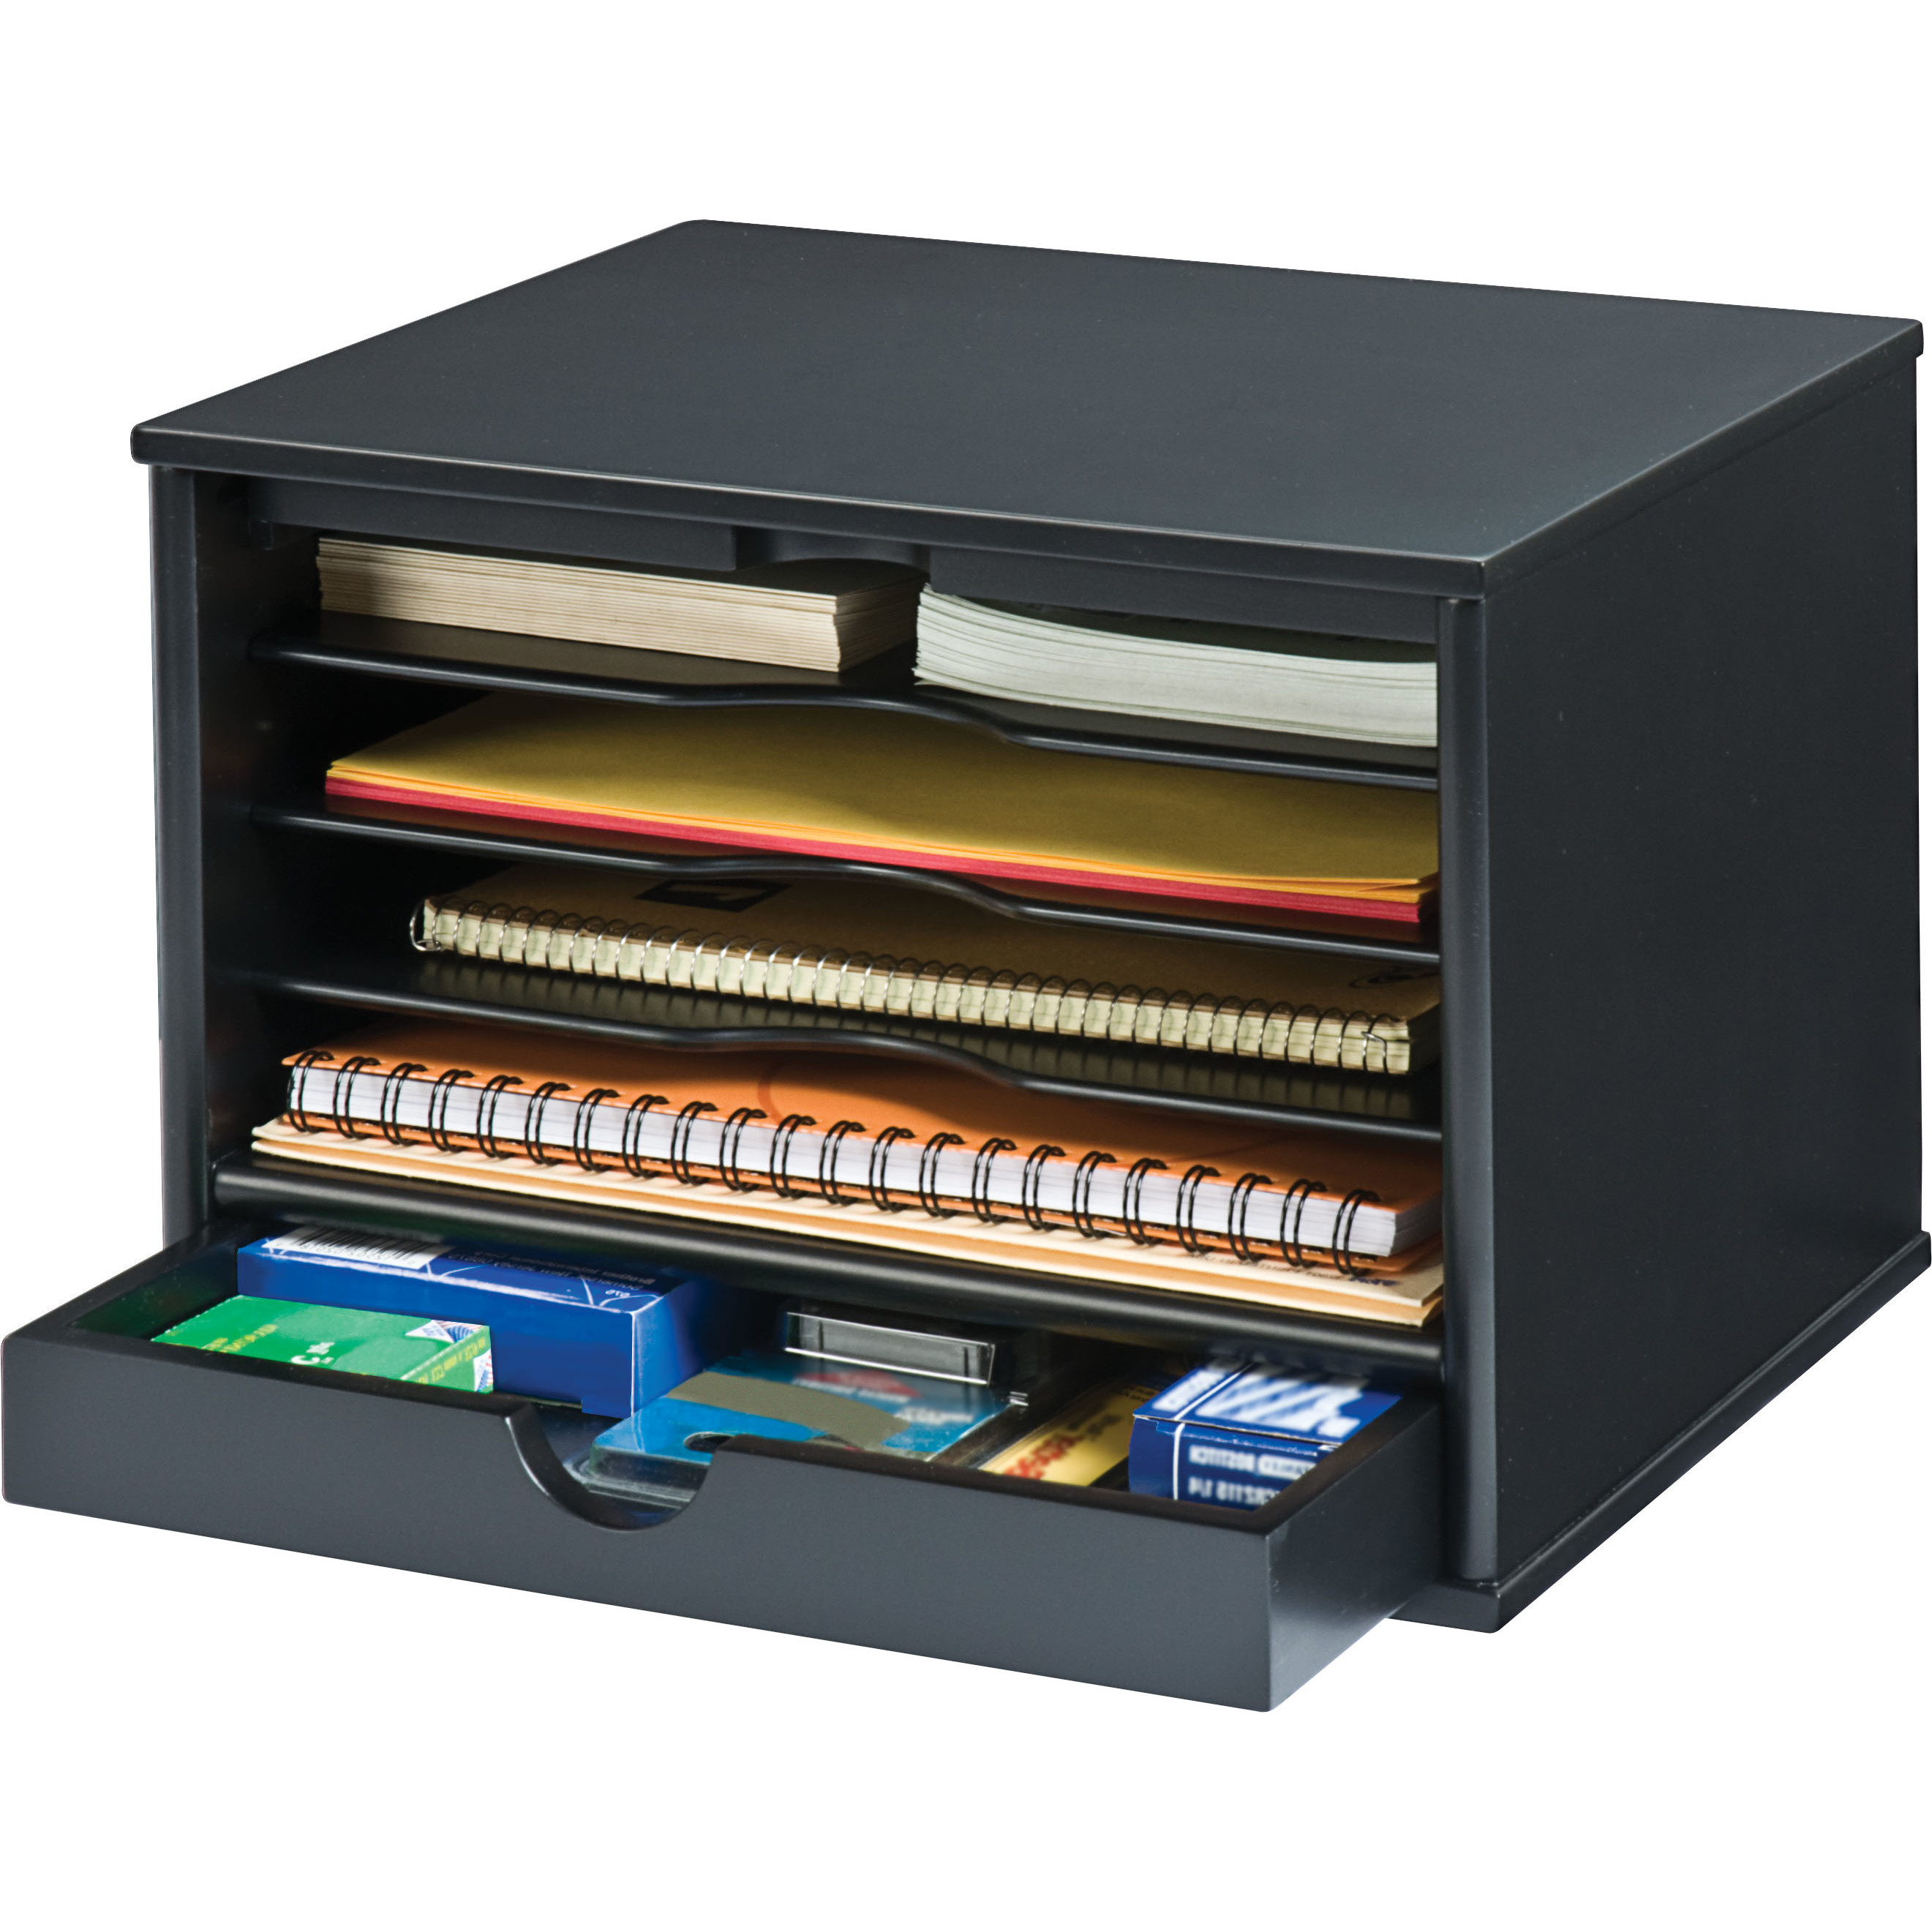 Desk Top Organizer  Victor Technology Desktop Organizer & Reviews